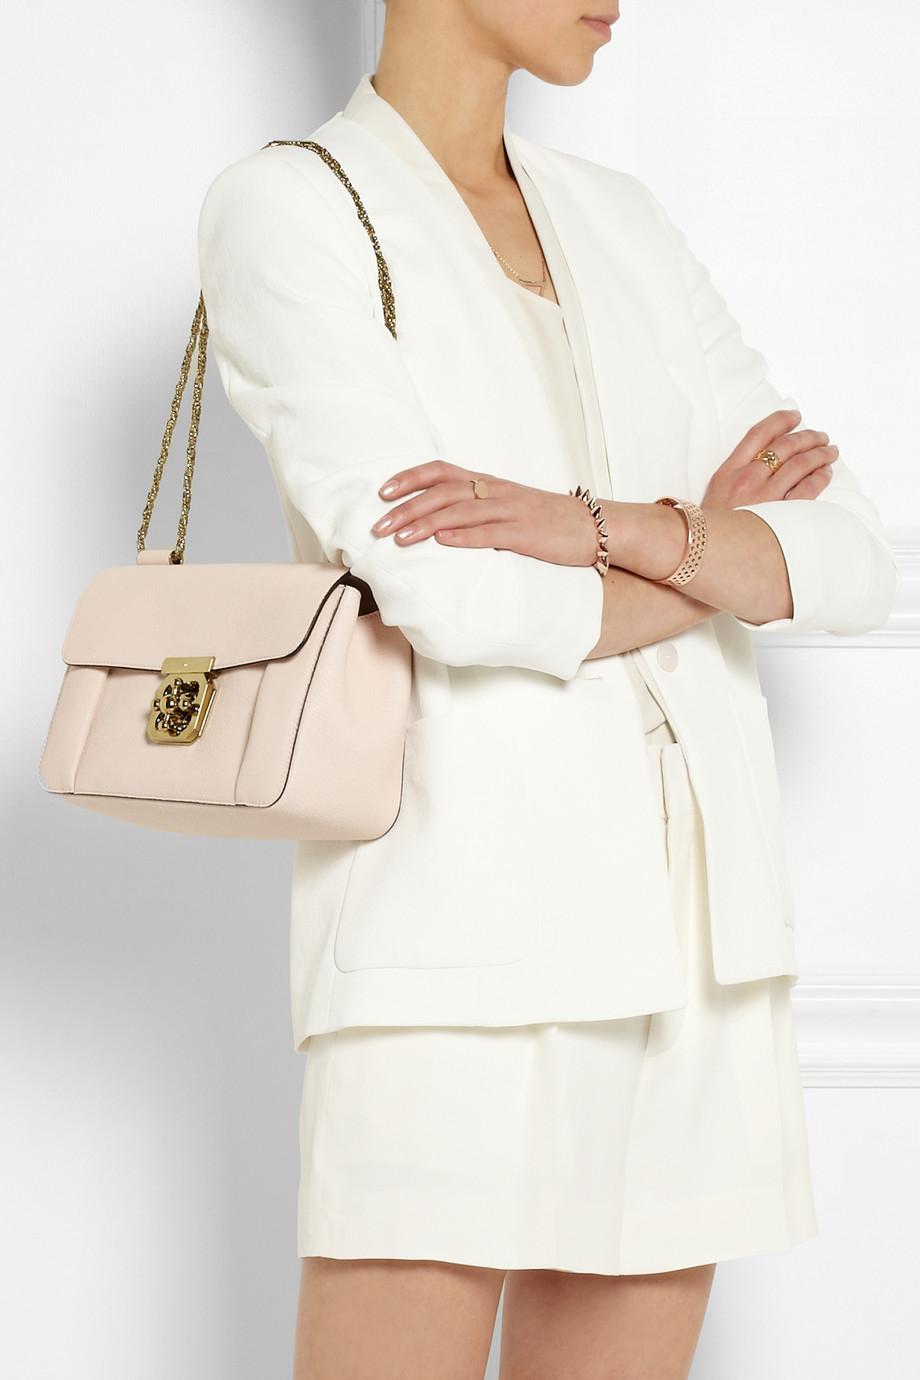 Chlo¨¦ Elsie Medium Texturedleather Shoulder Bag in Pink | Lyst